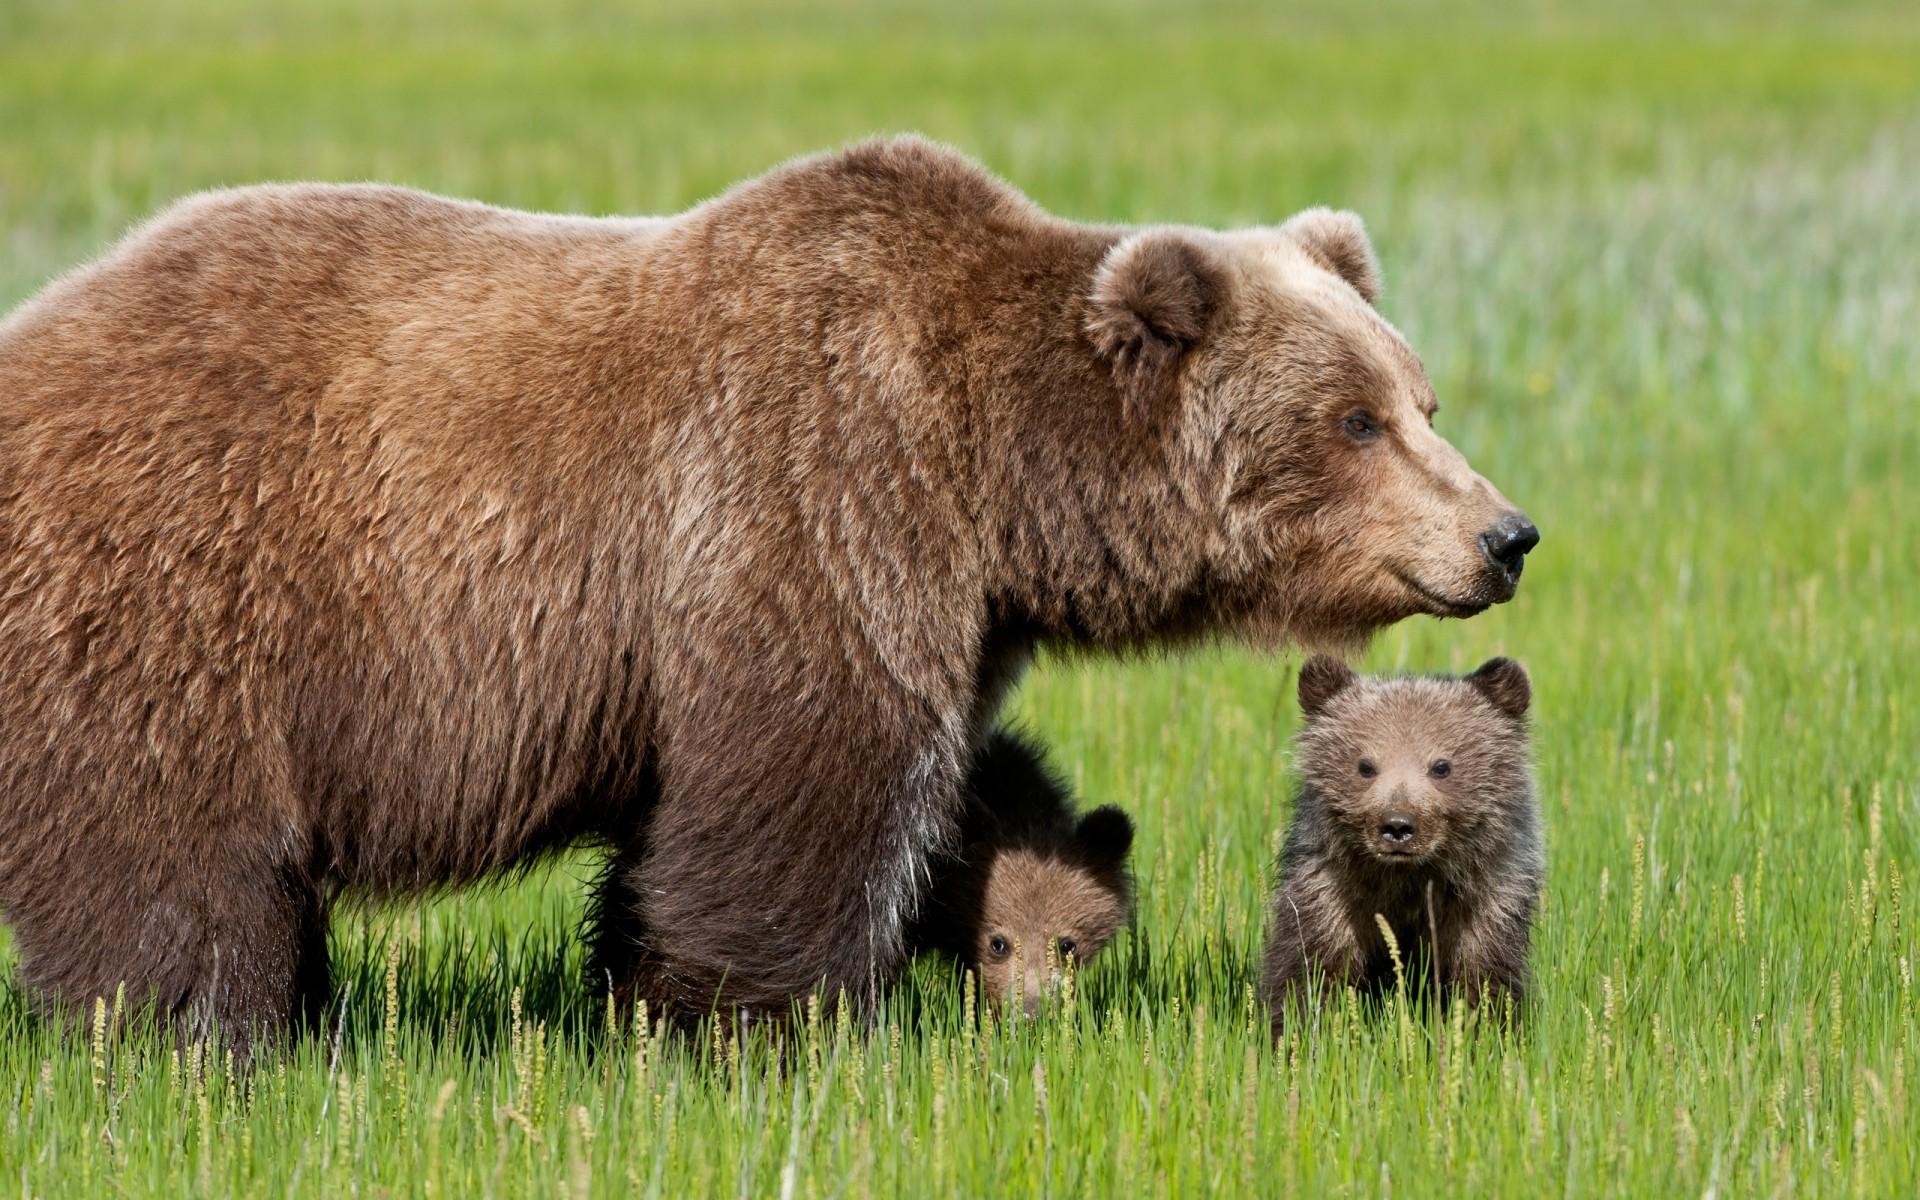 Photos of brown bears